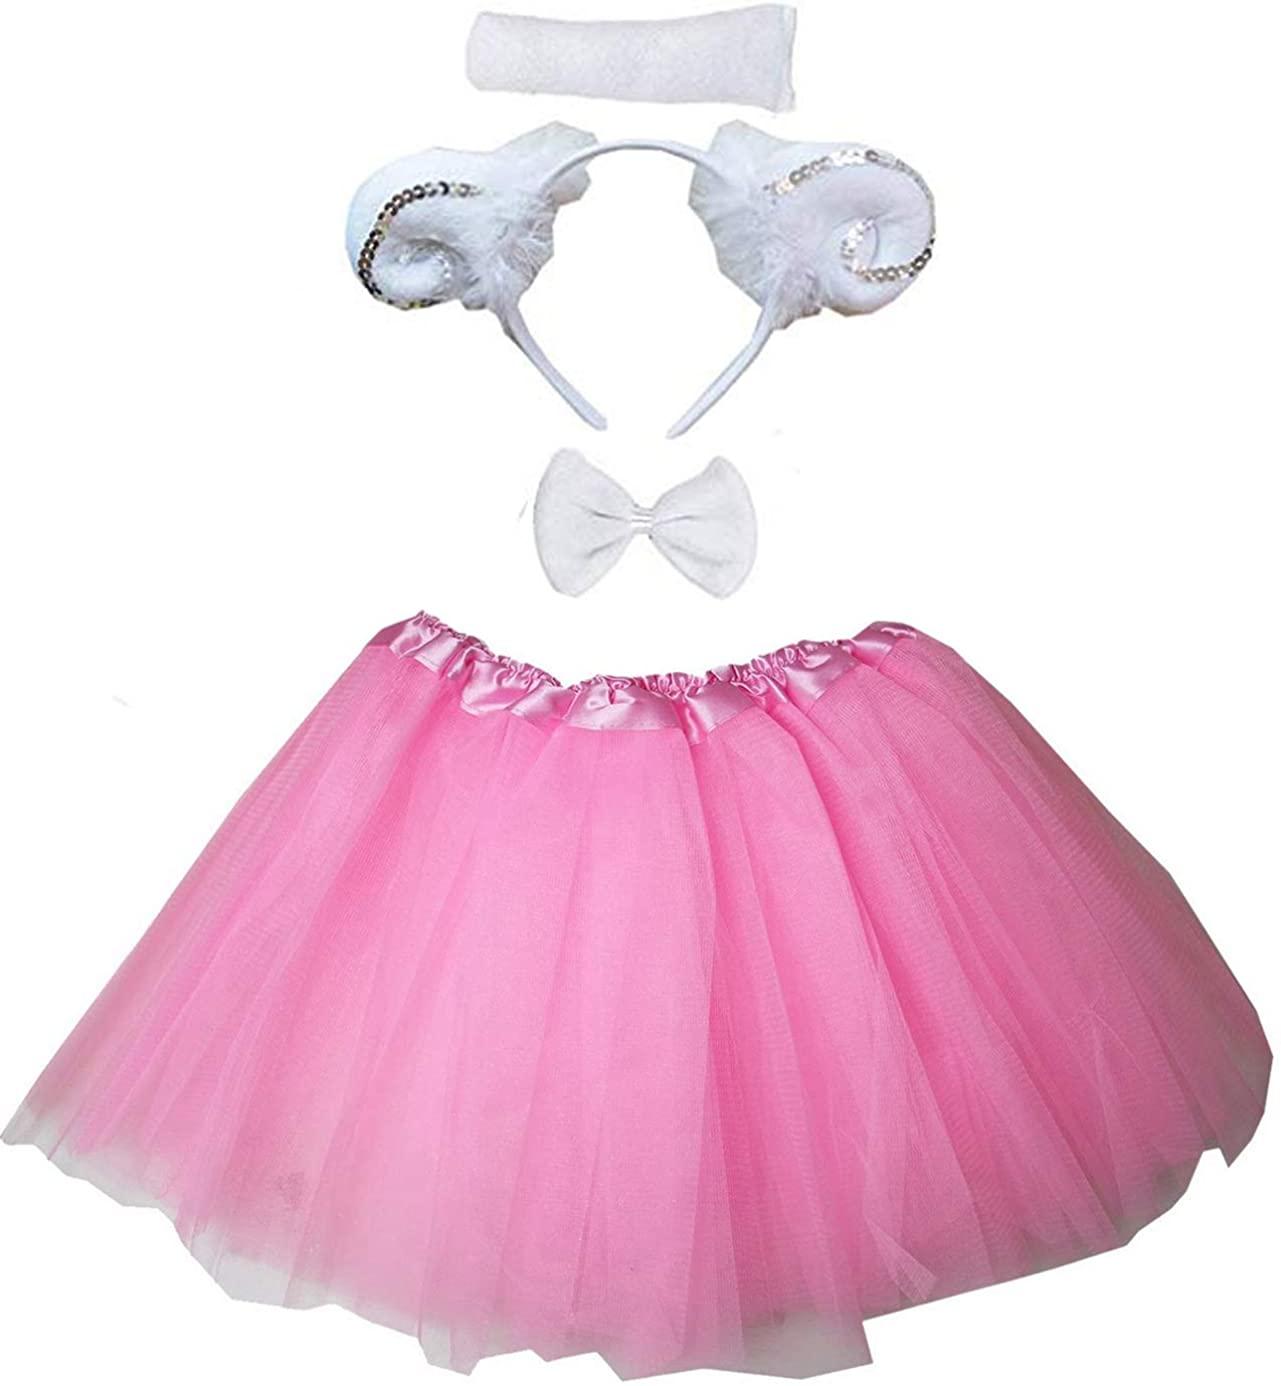 Kirei Sui Kids Costume Tutu Set Pink Sheep